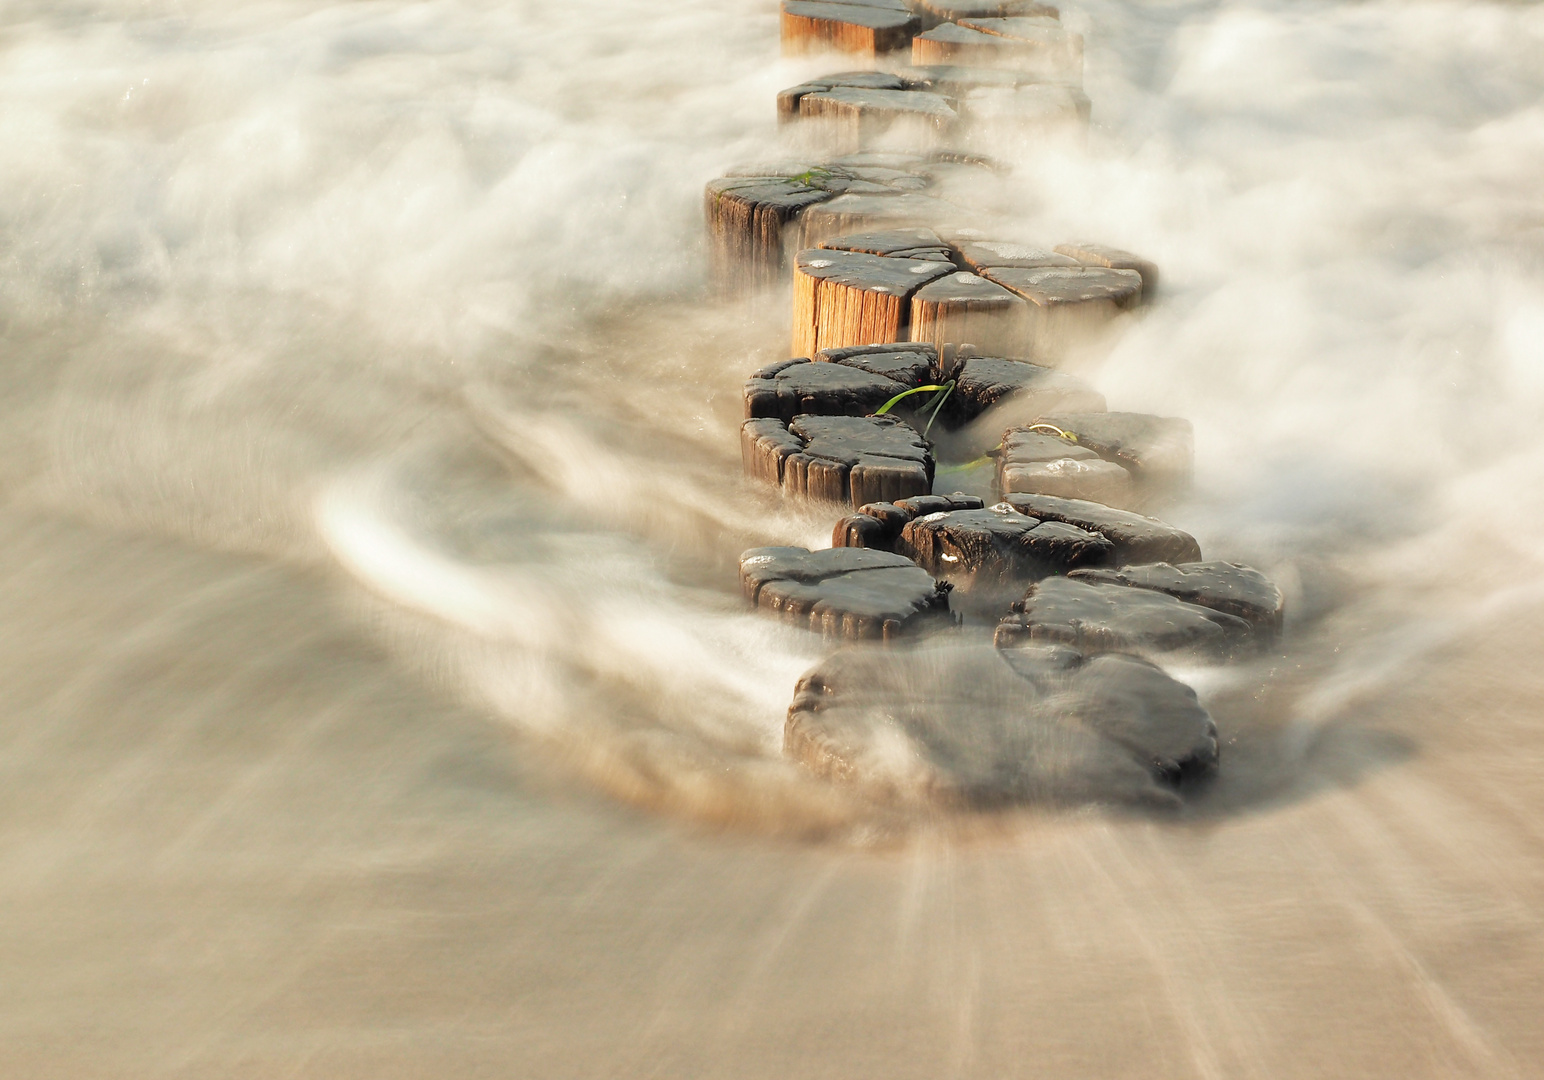 den Wellen zusehen